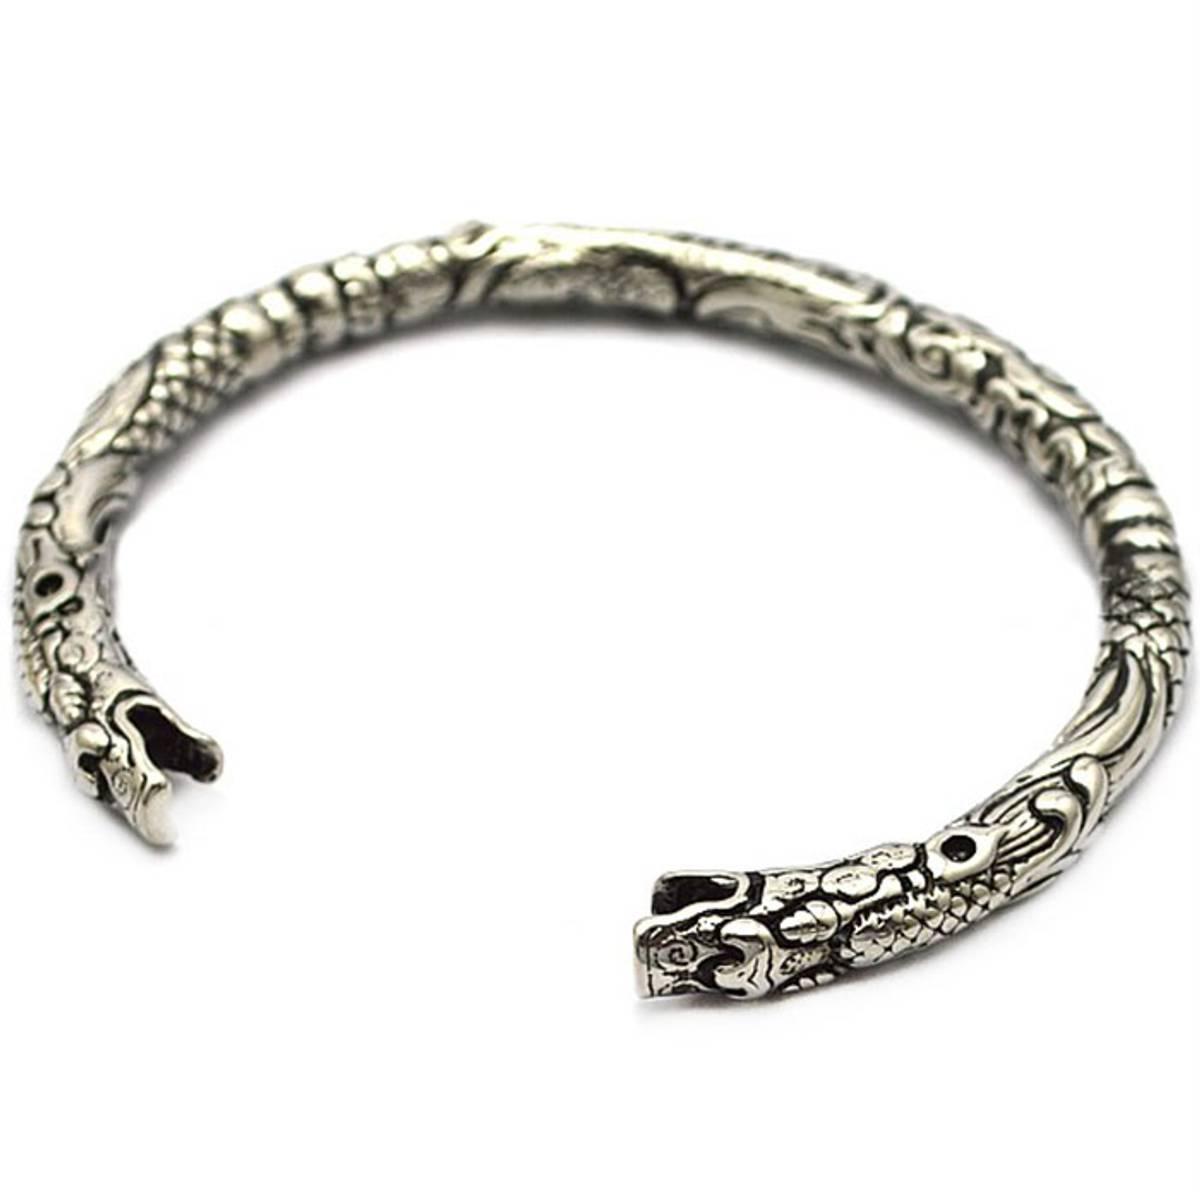 Vikinginspirert armring i stål